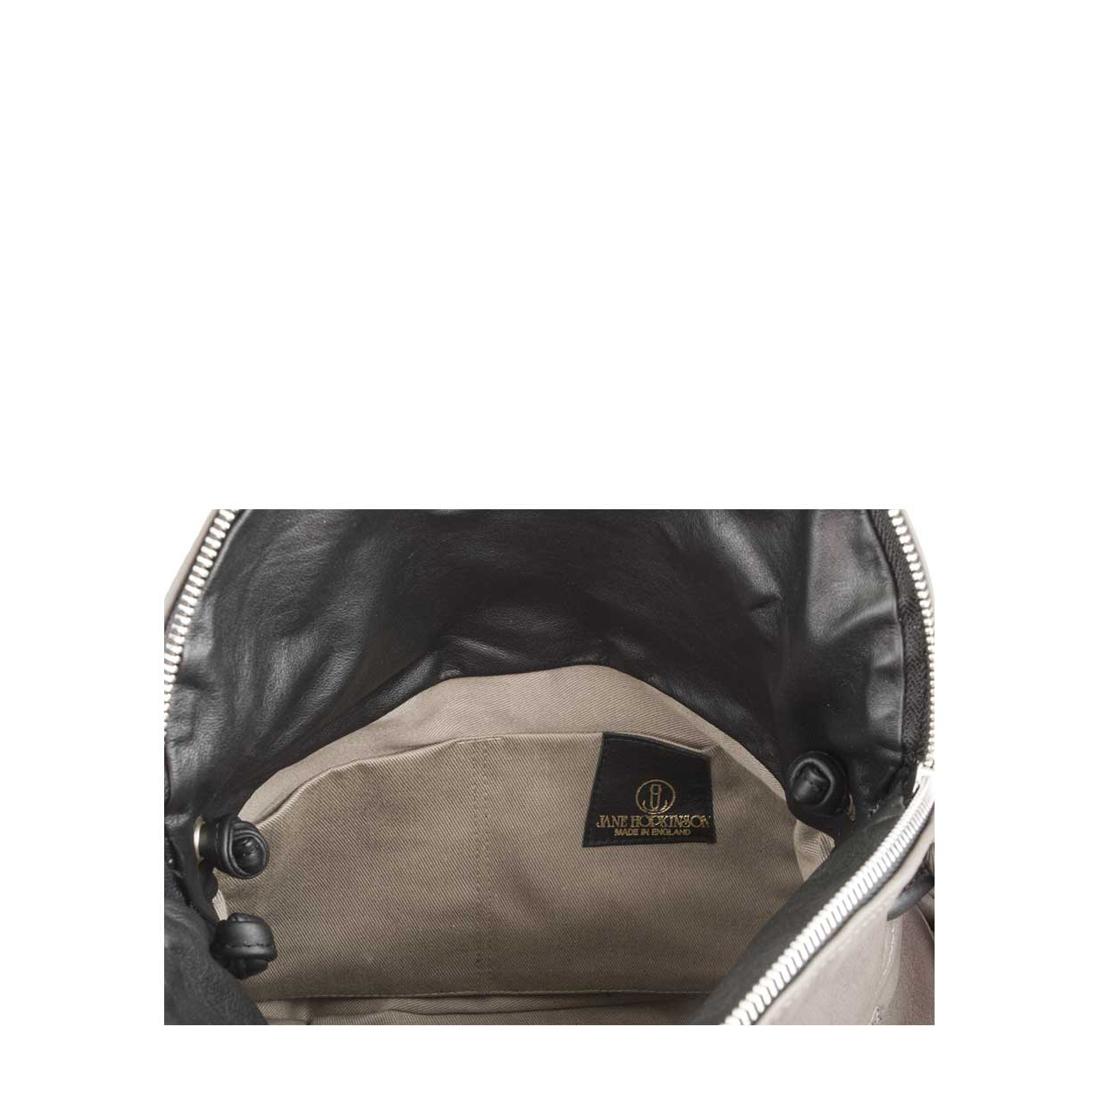 Milly Grigio Leather Shoulder Bag